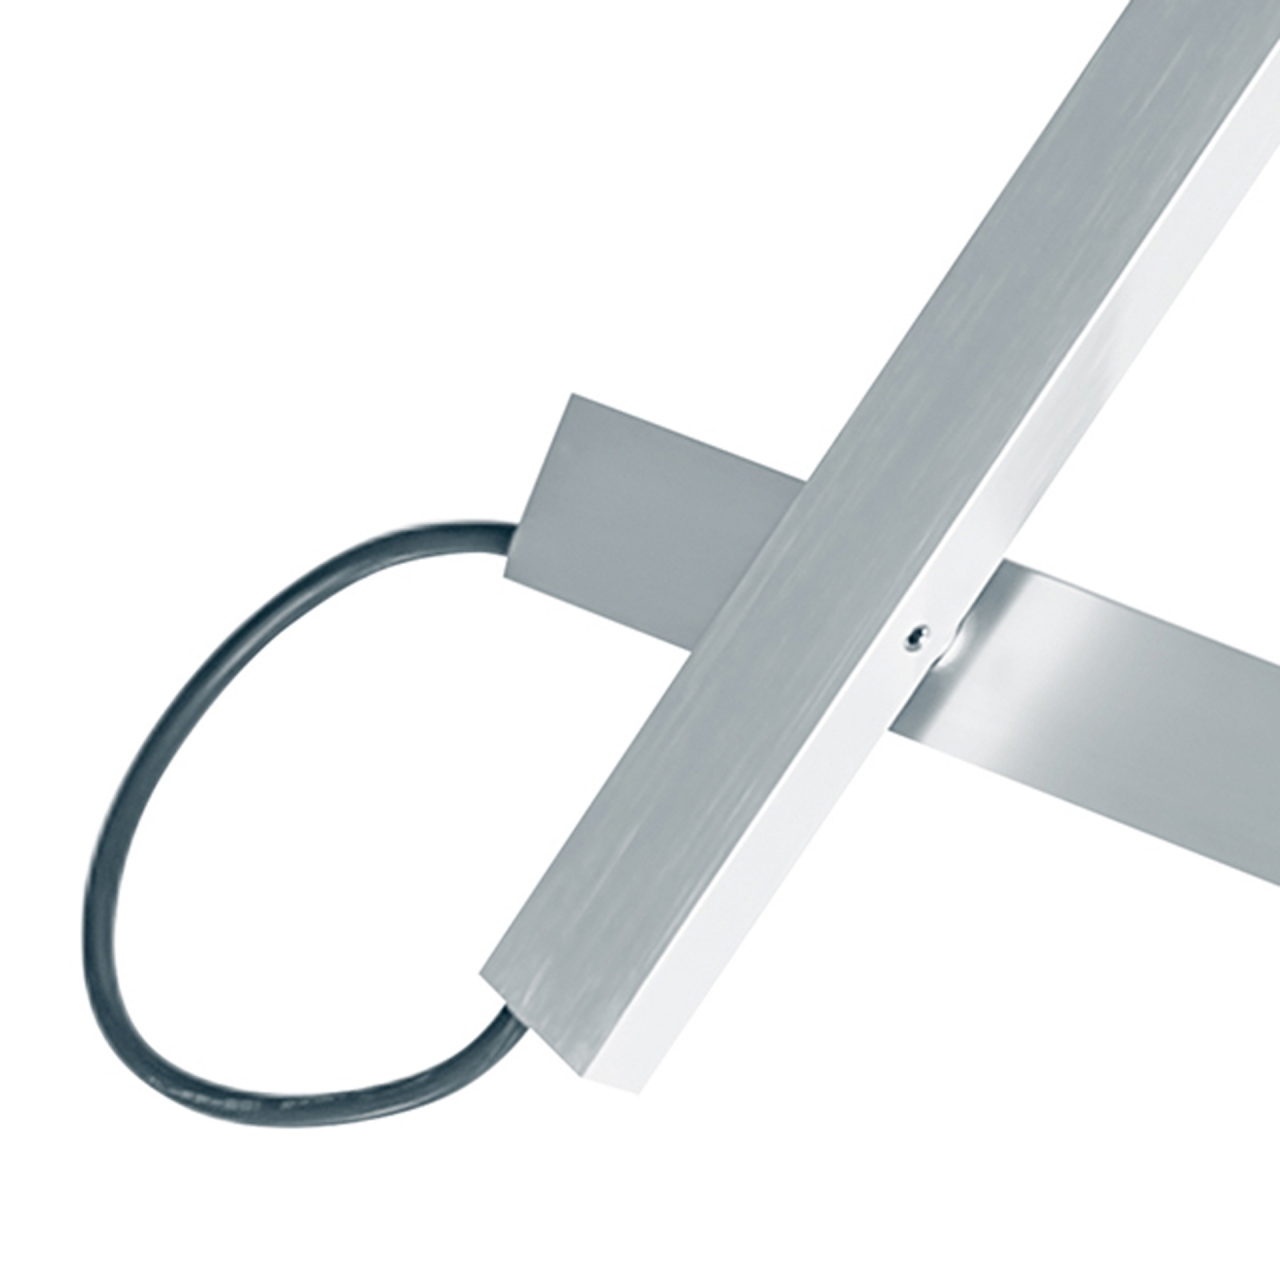 Люстра потолочная MECCANO 1х60W E27 хром / белый ткань Lightstar 766019